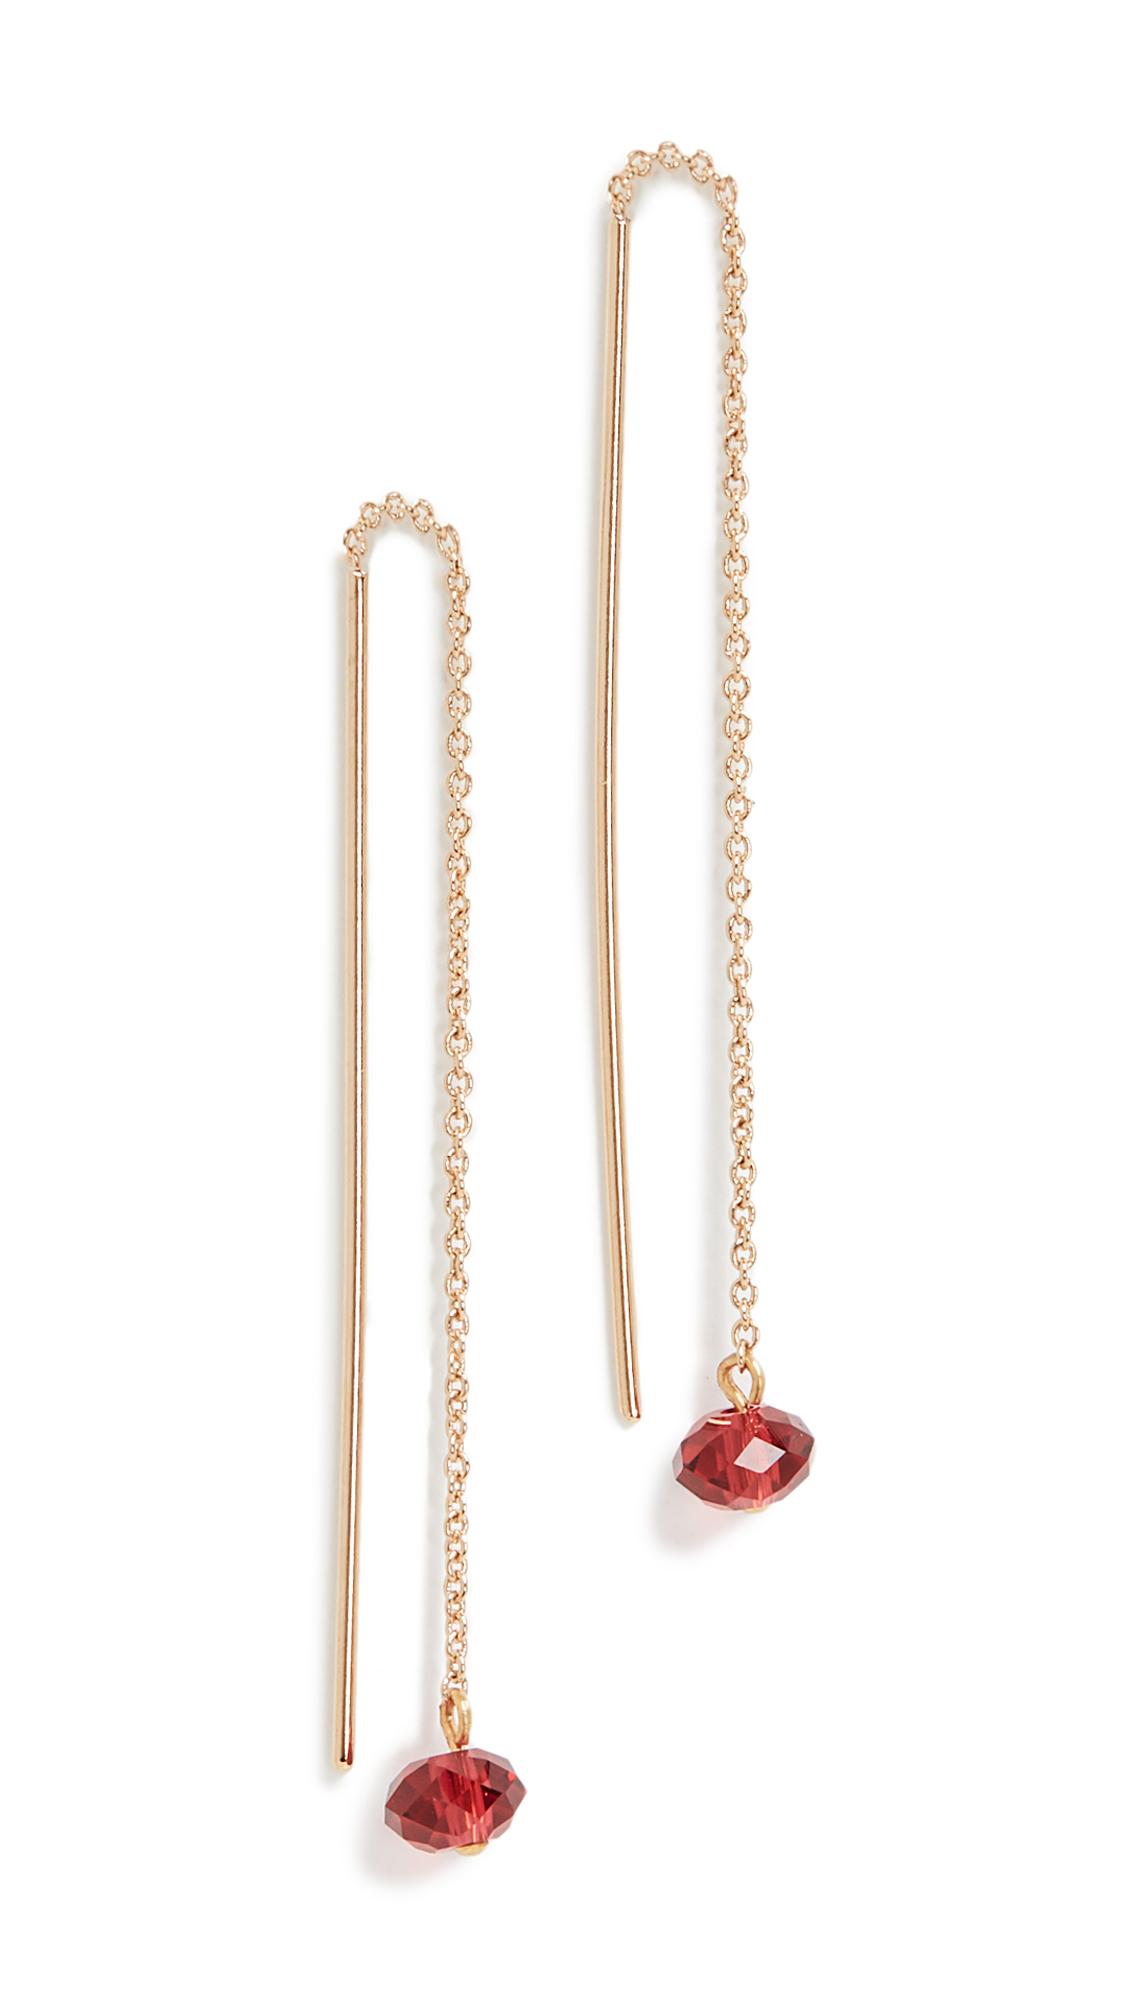 Isabel Marant Polly Earrings